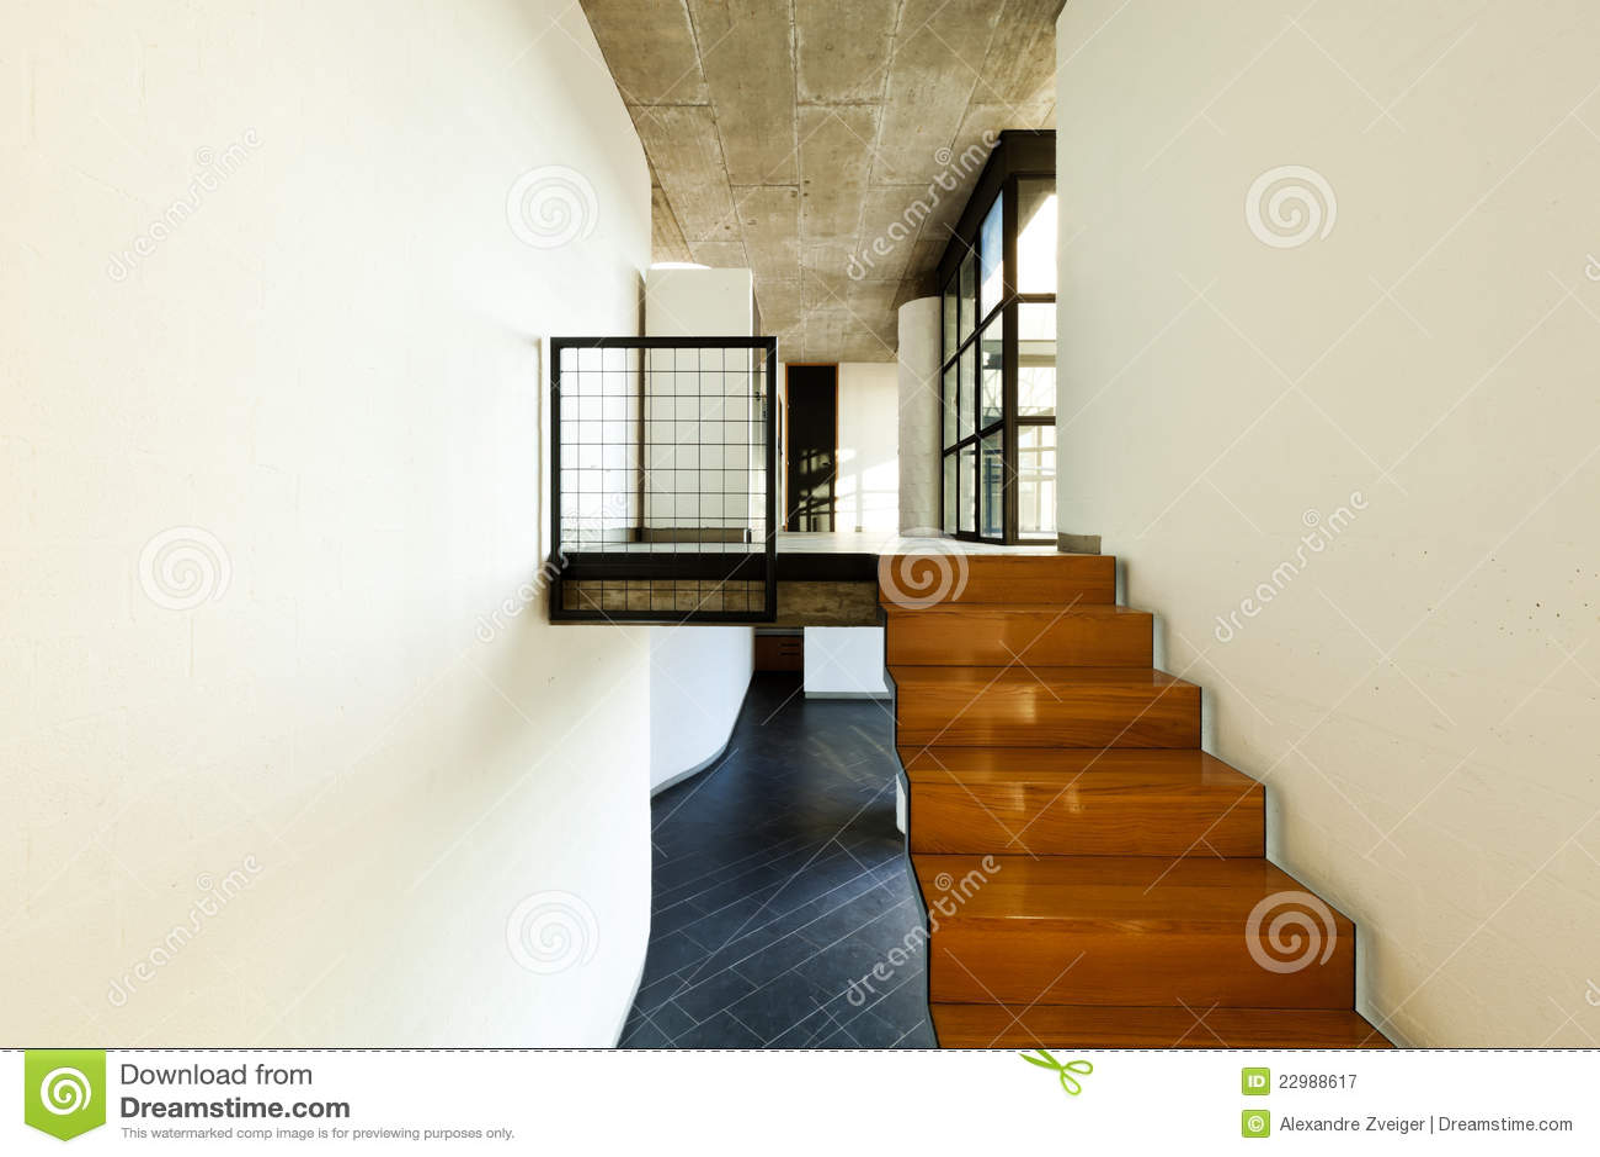 casa interior escalera de madera fotografa de archivo libre de regalas